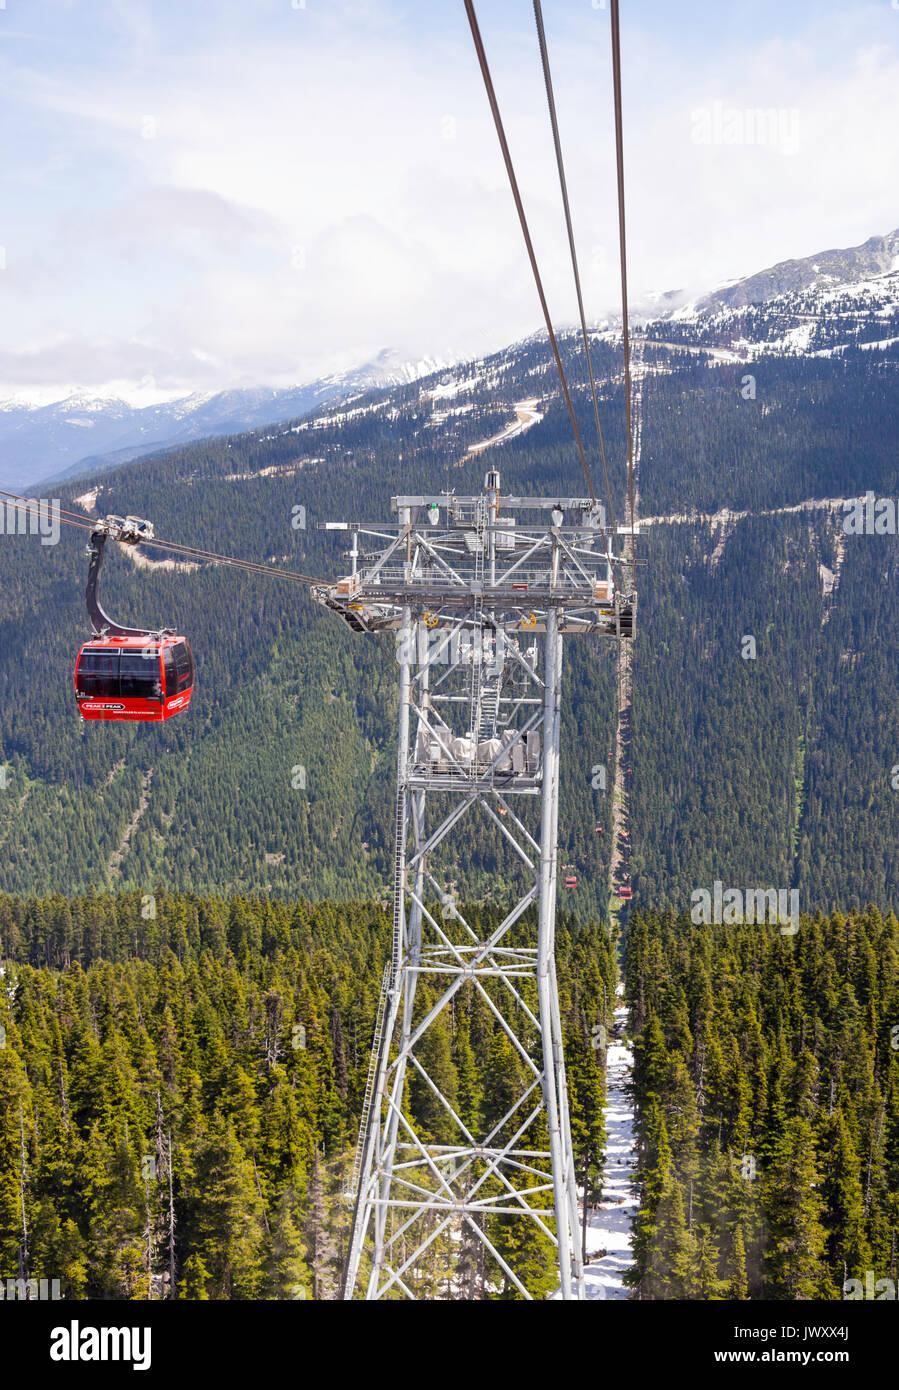 The Peak 2 Peak Gondola Ride at the Whistler Blackcomb Mountain Ski Resort and Mountain Bike Area Whistler British Columbia Canada - Stock Image